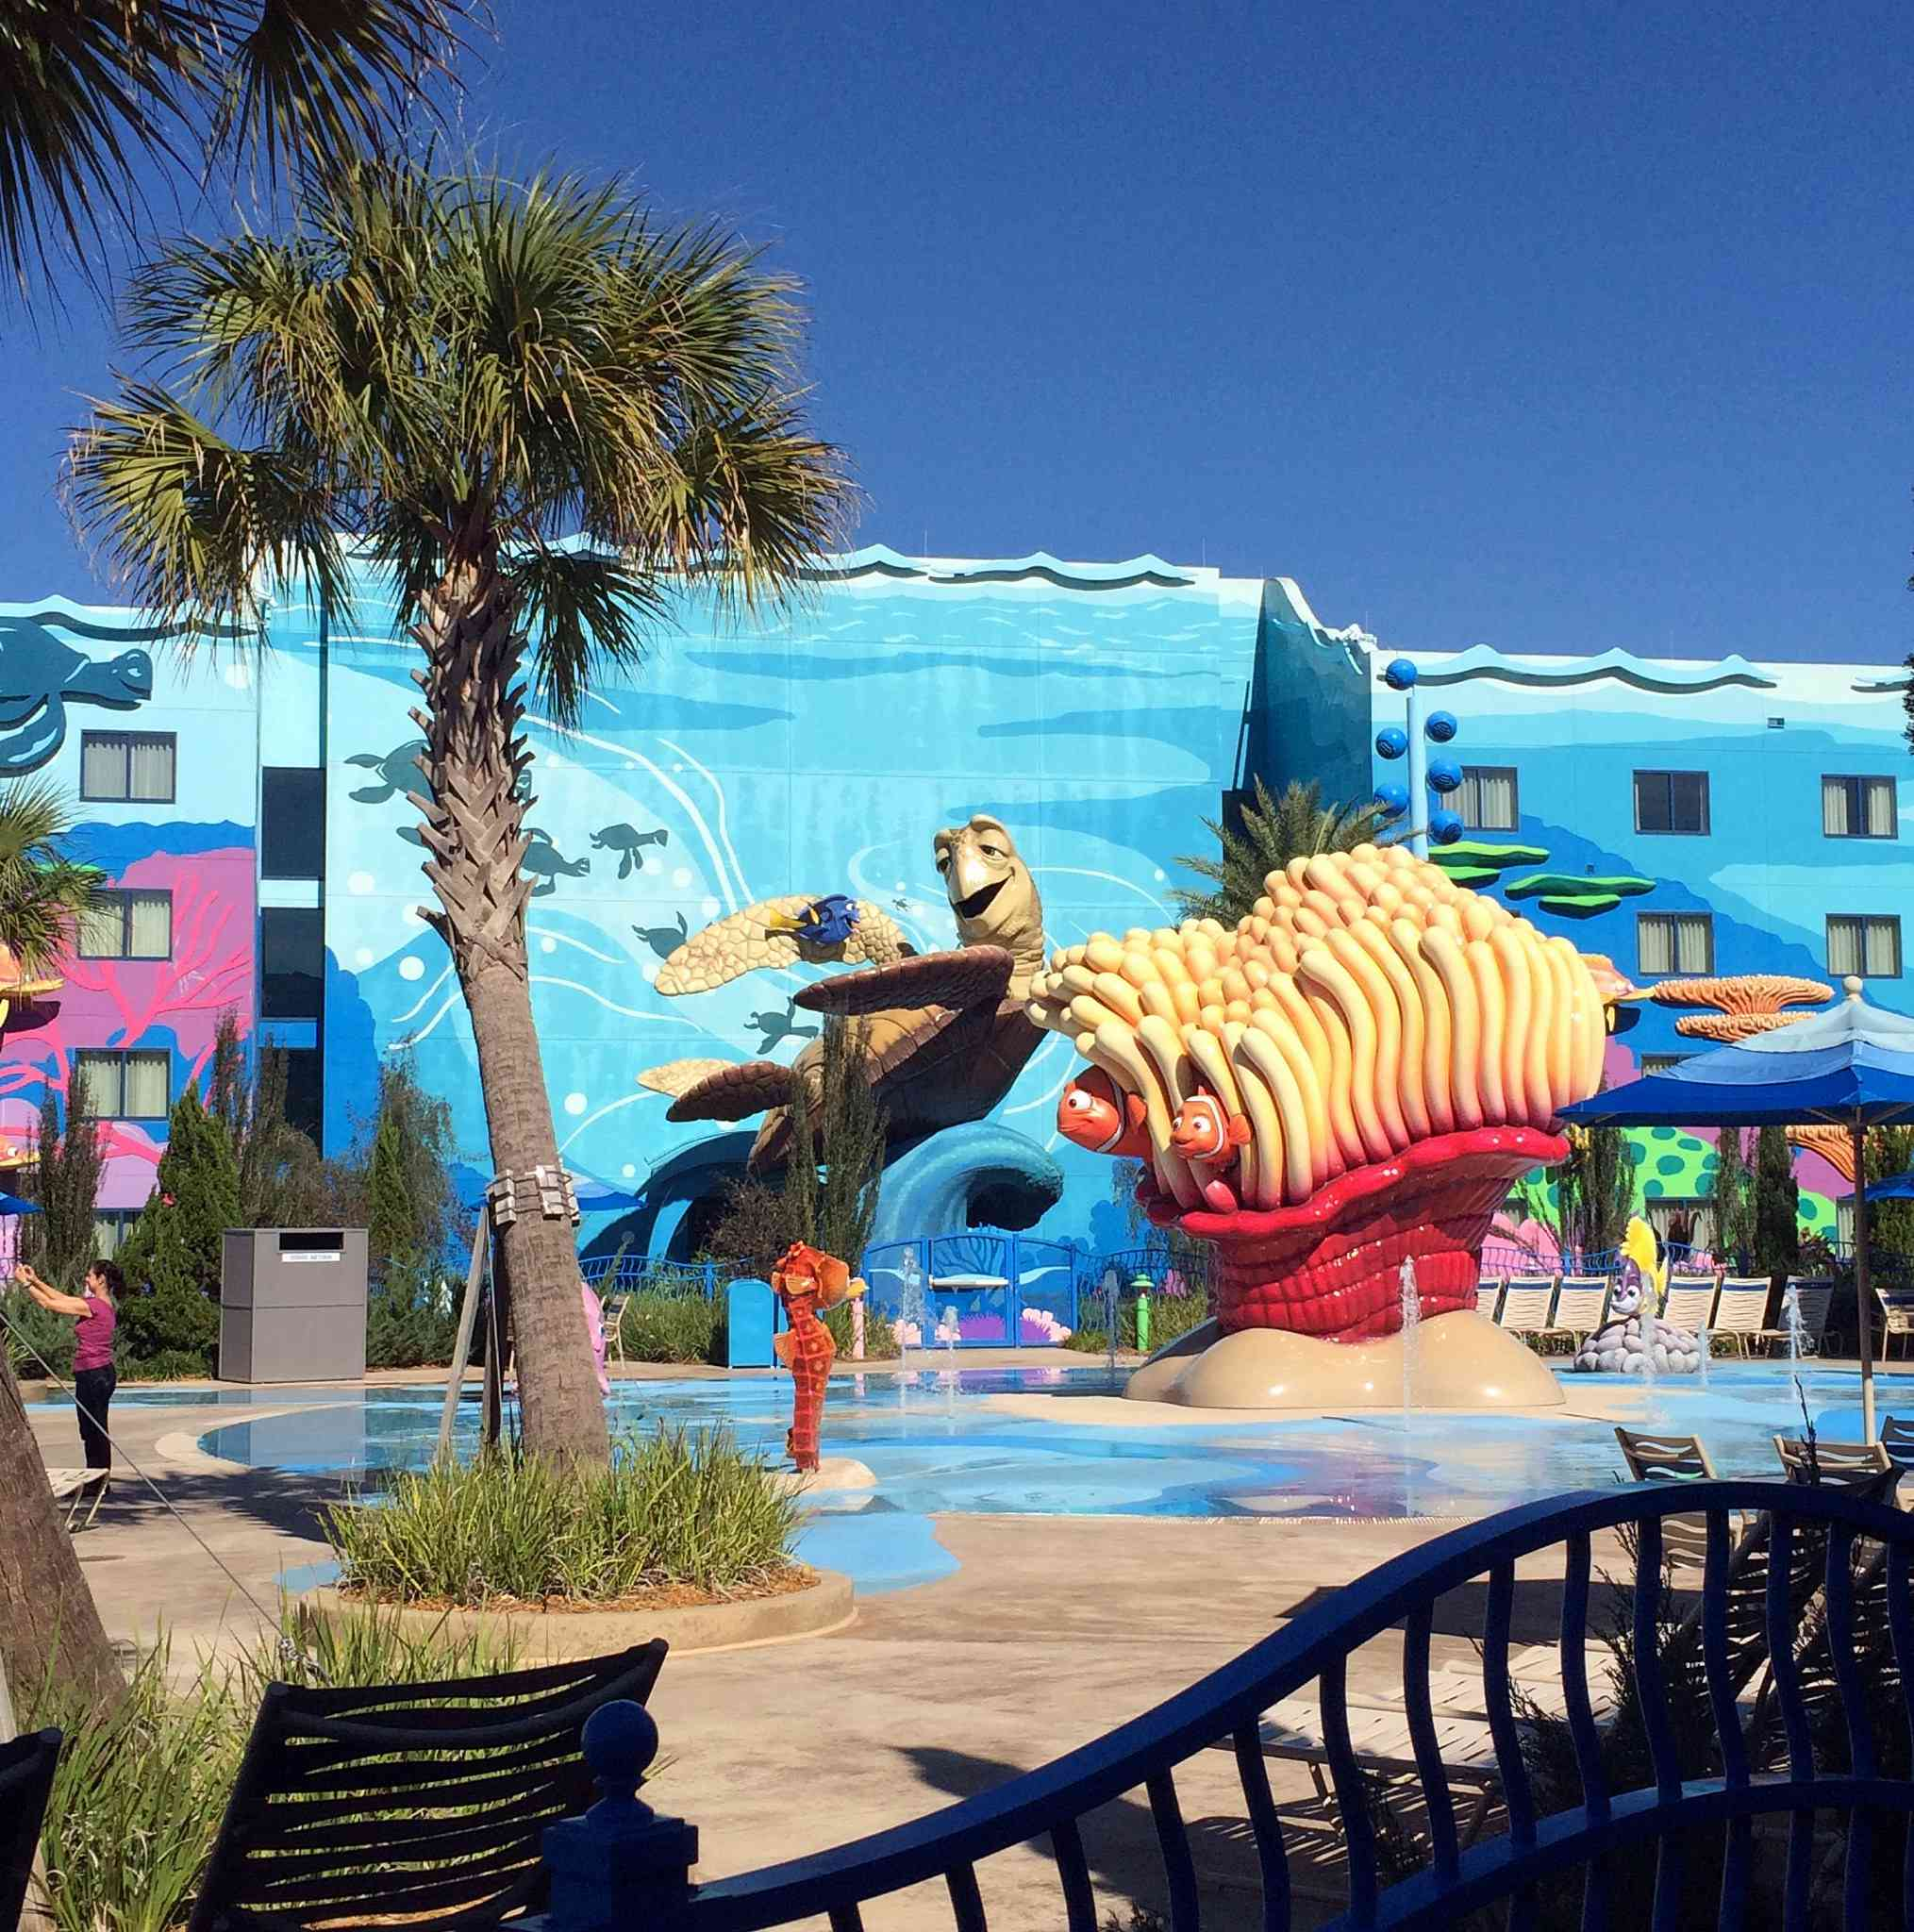 Disney's Art of Animation Resort - Finding Nemo - The Big Blue Pool